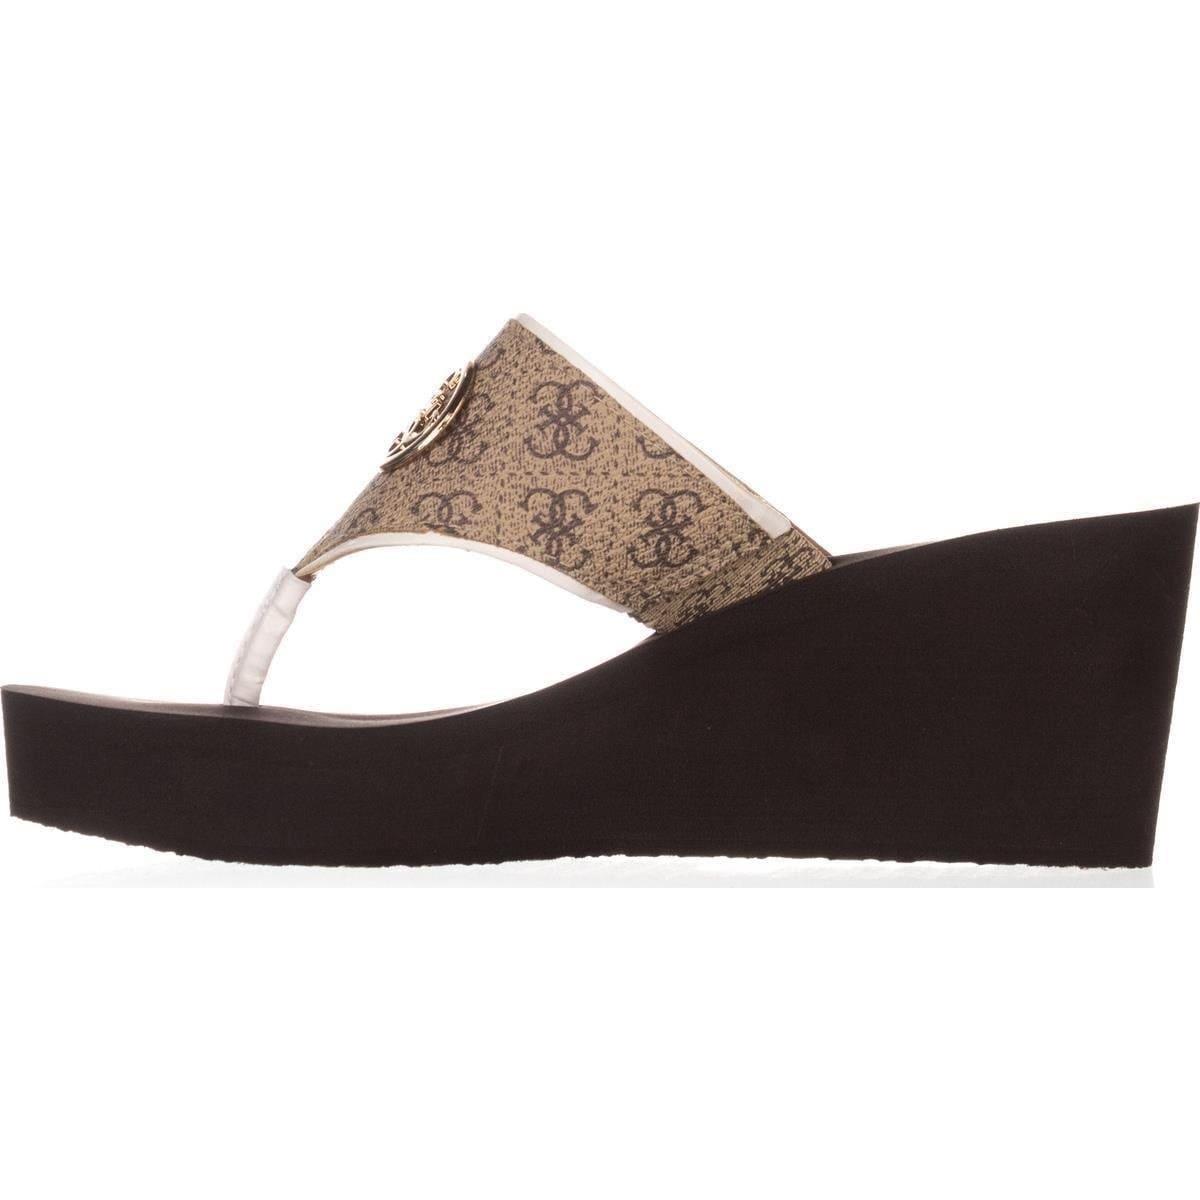 GUESS Womens Solene Thongs Wedges Wedge Sandals